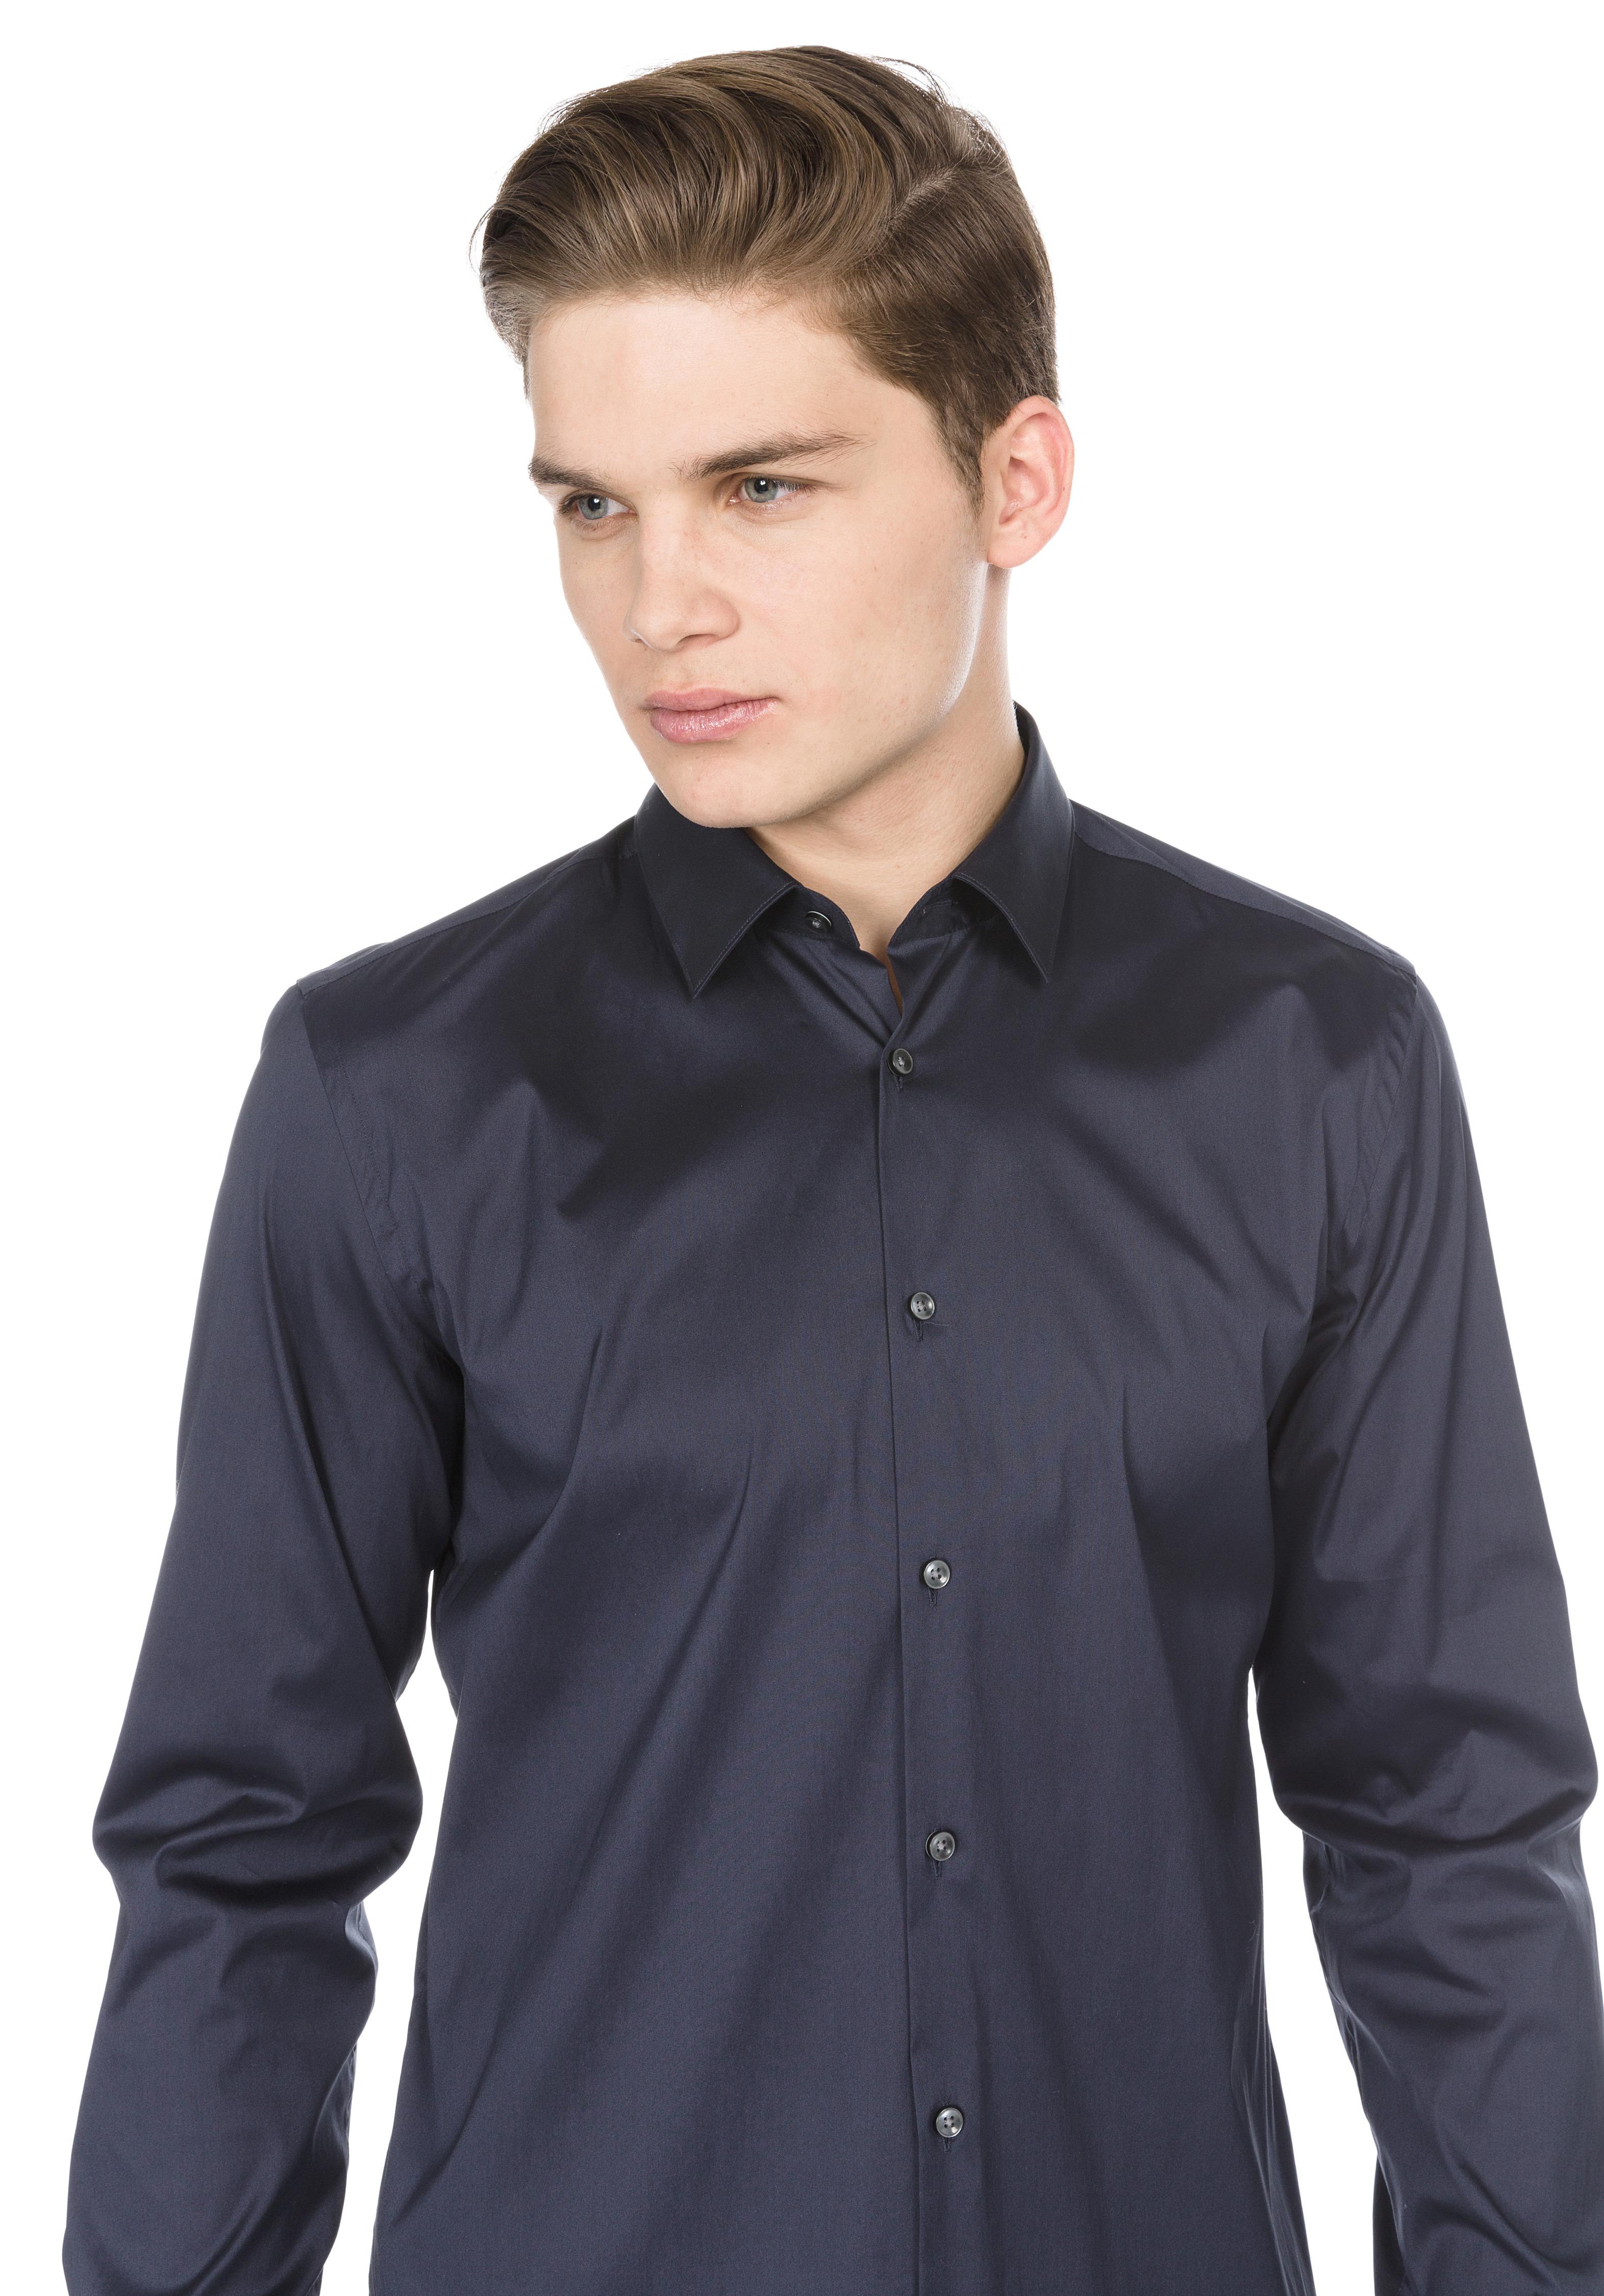 9f585bf28 Hugo Boss Isko Shirt 50375210 Modra - Ceneje.si